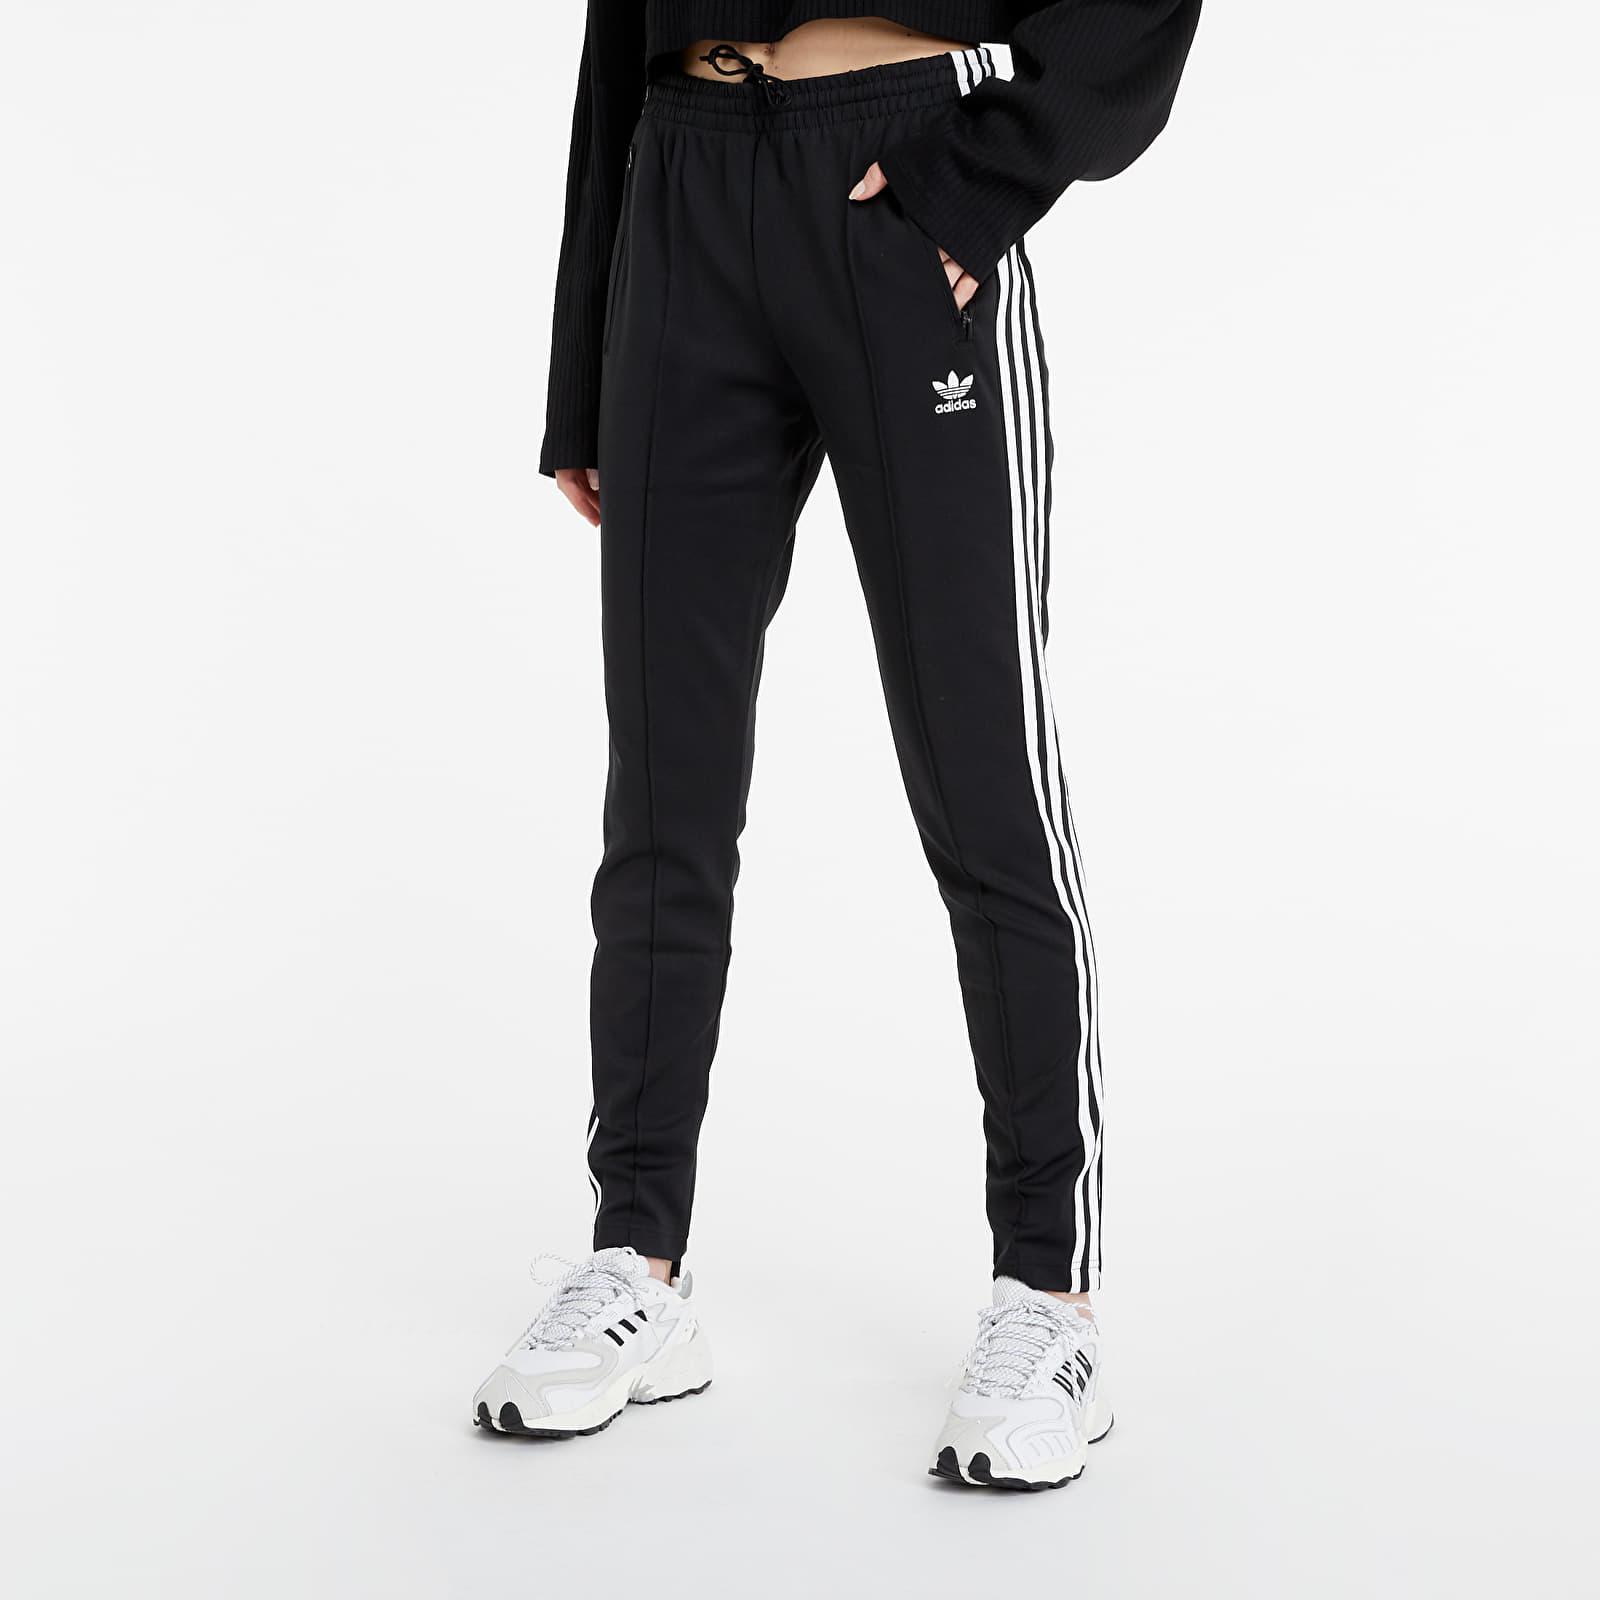 adidas Primeblue SST Track Pants Black/ White EUR